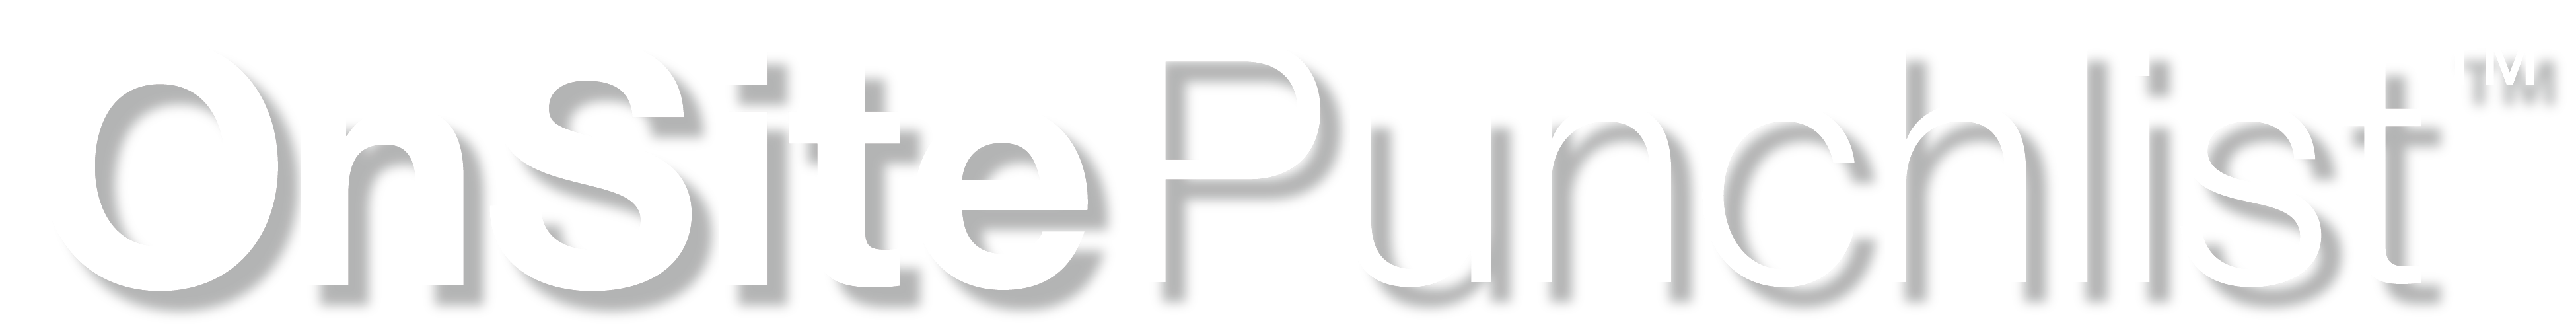 onsitepunchlistlogotext-01.png